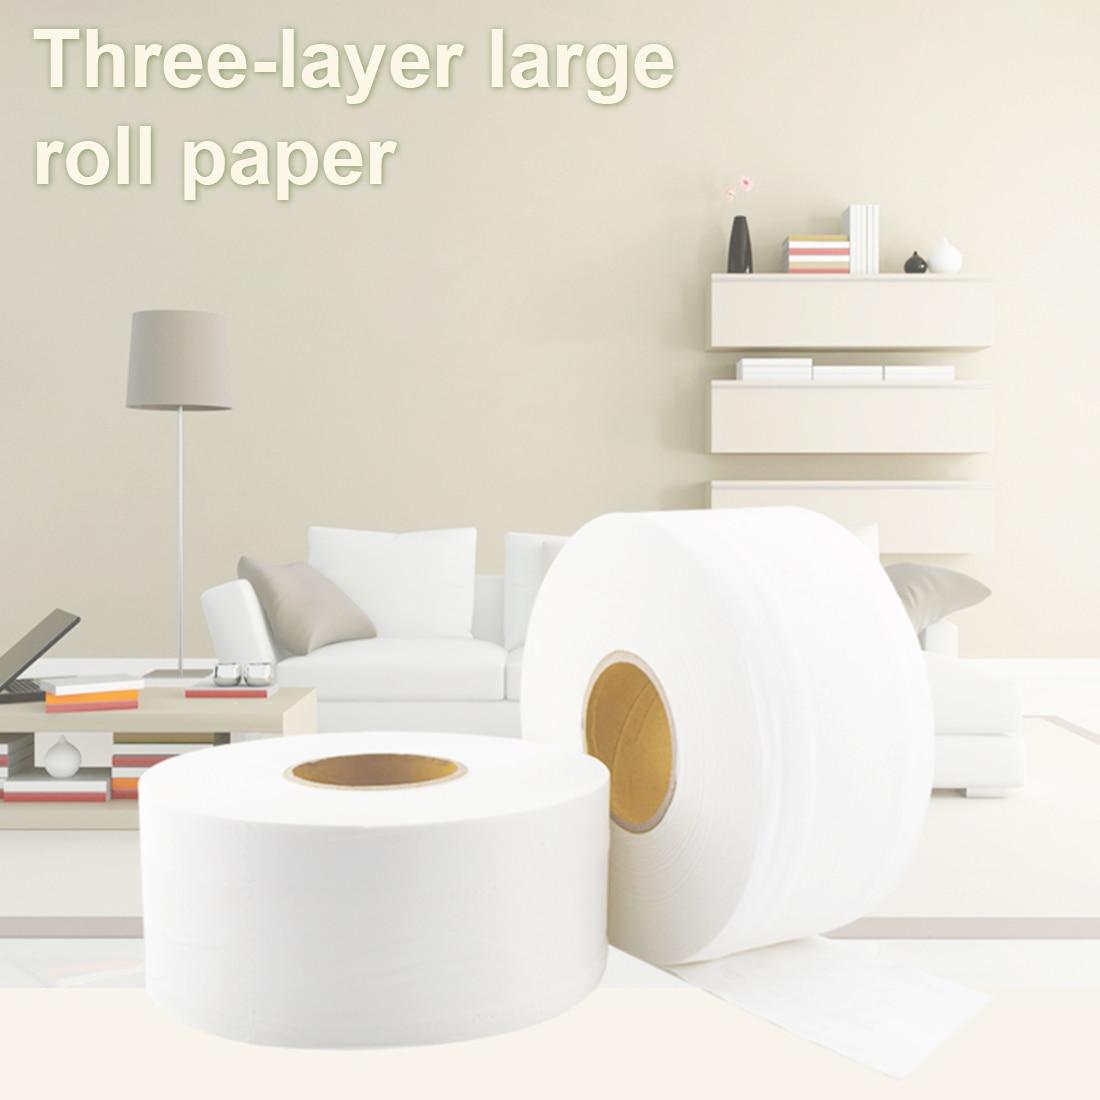 Papel higiénico, rollo de papel para baño o cocina, 580g, rollo de papel Jumbo Ultra comercial, toallas de papel para el hogar, uso público, para Hotel